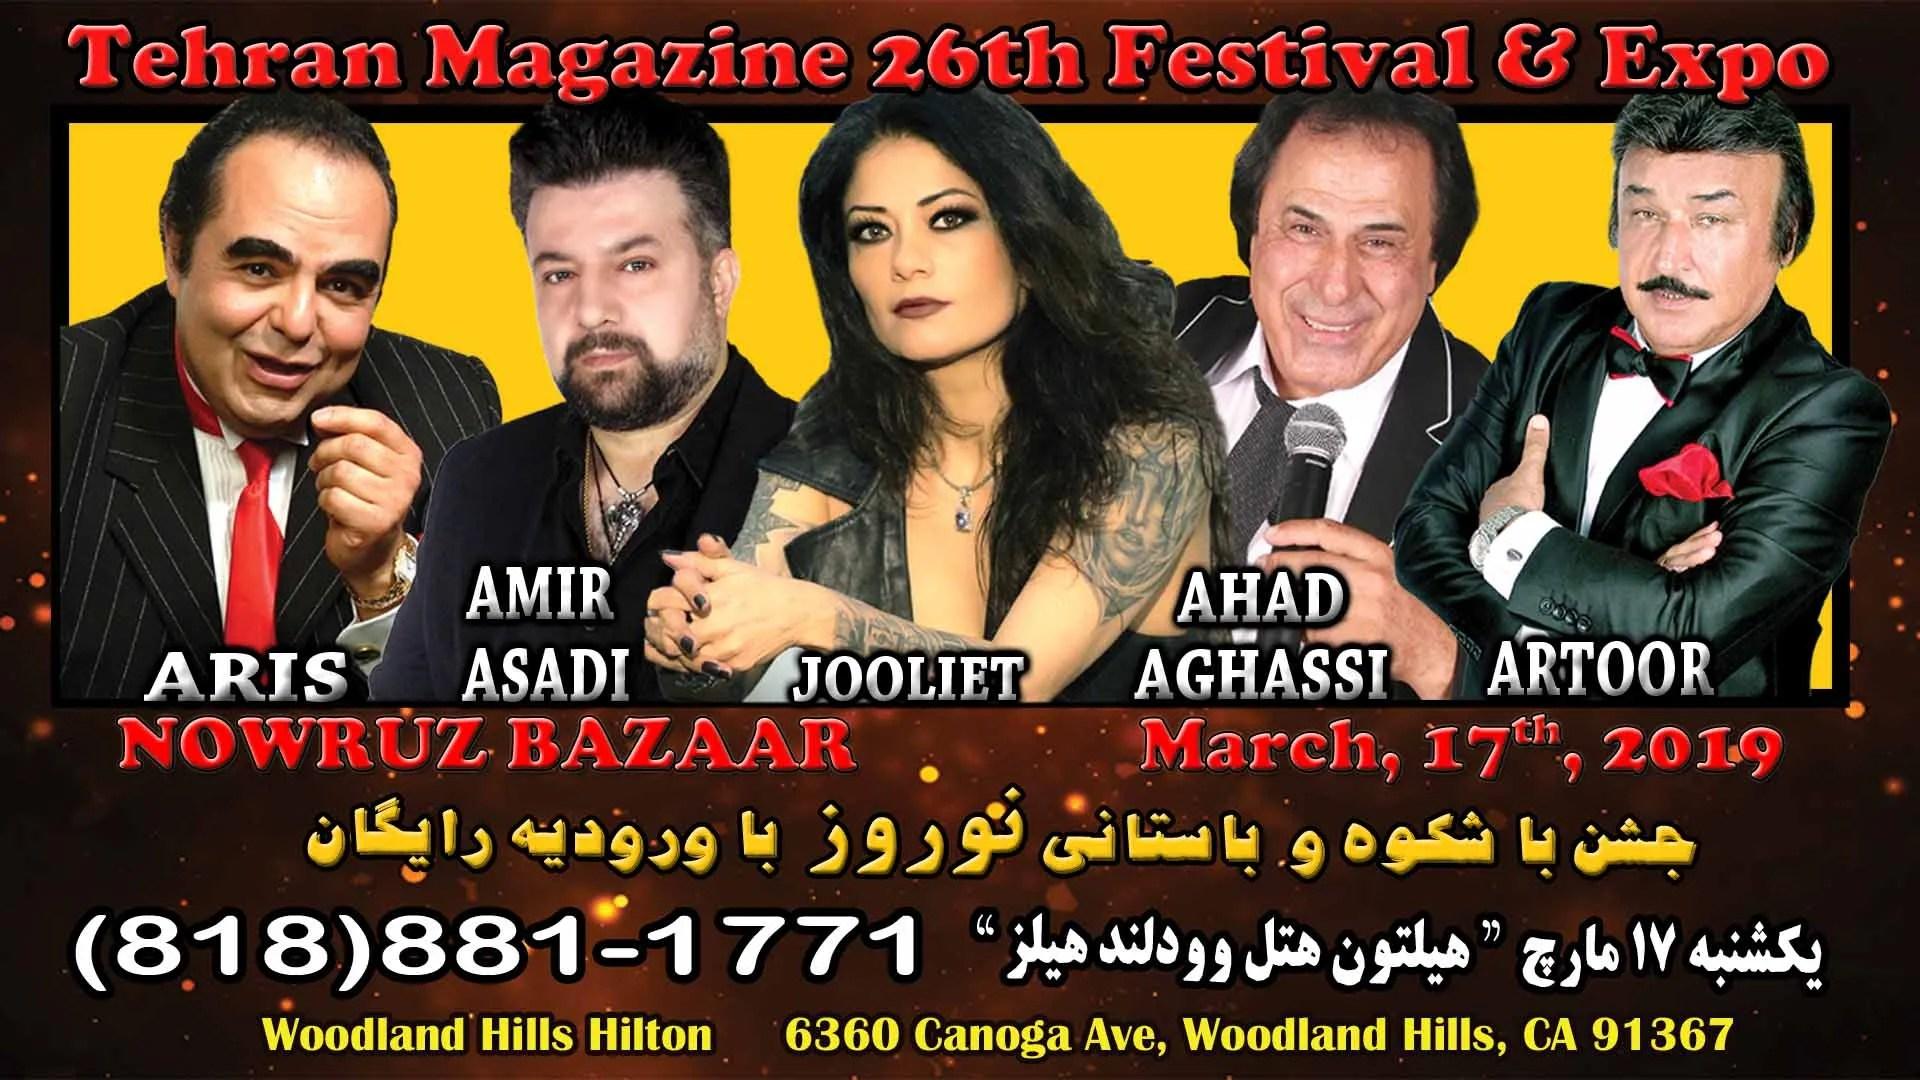 shahbod-noori-tehran-magazine-festival